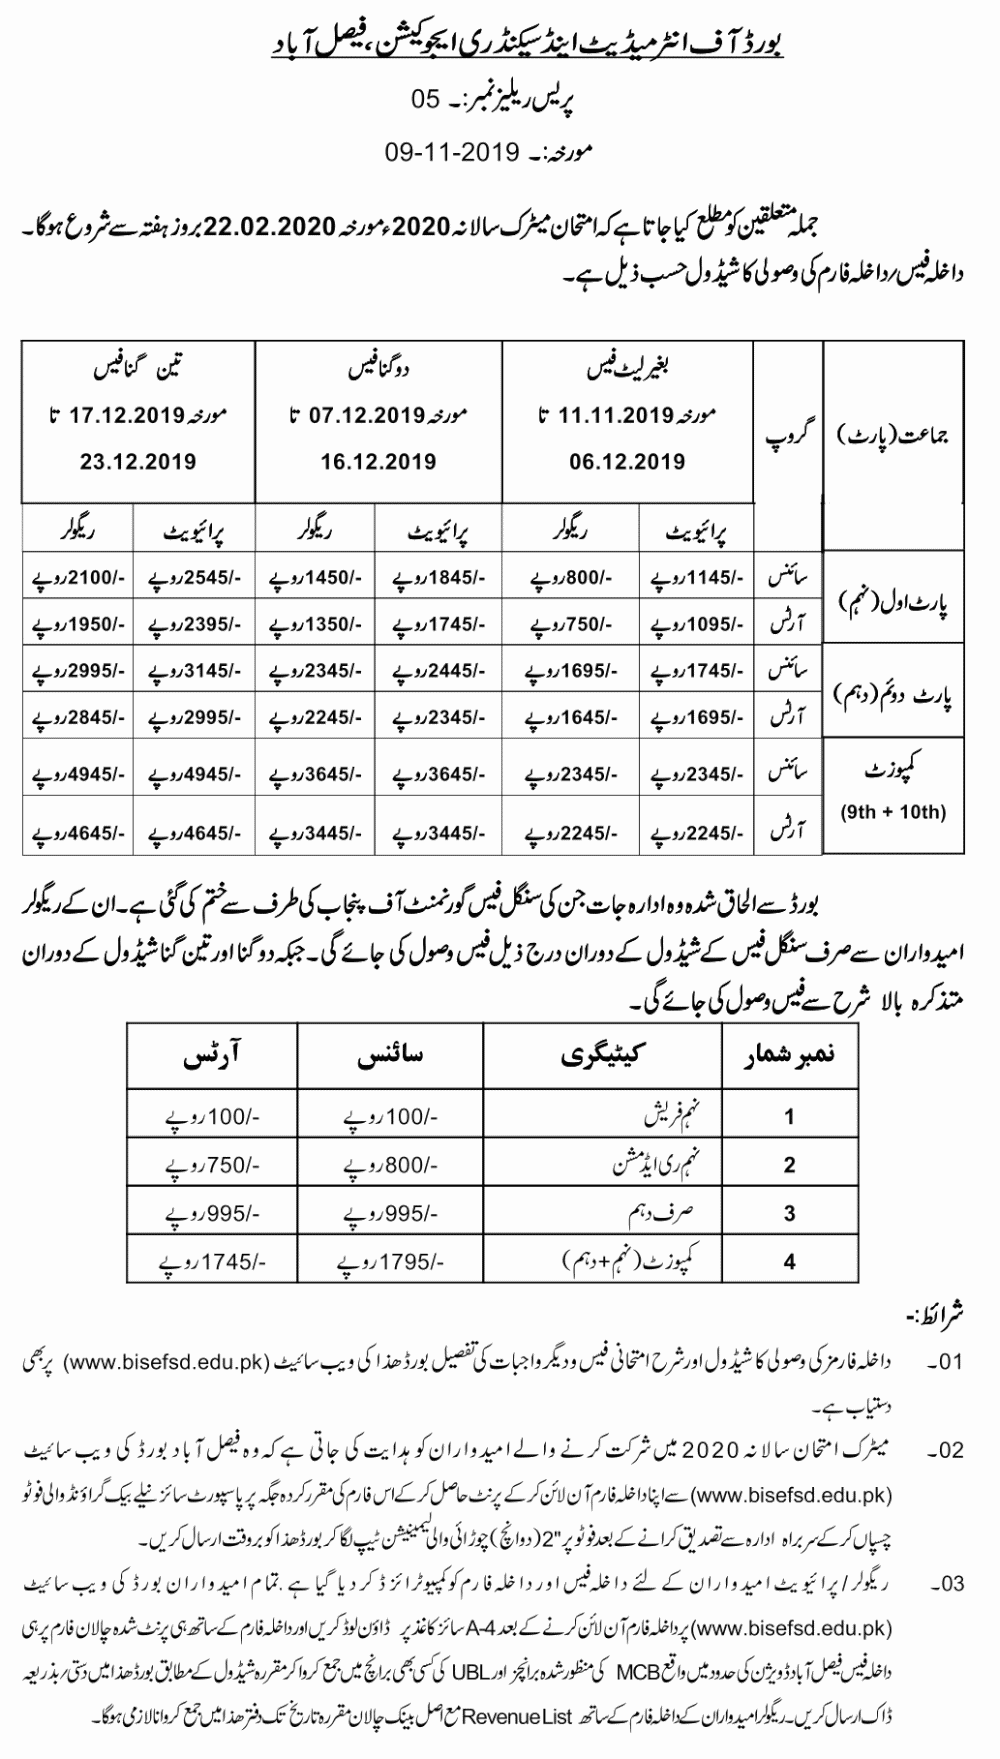 Faisalabad-board-ssc-exam-schedule-2020-page1